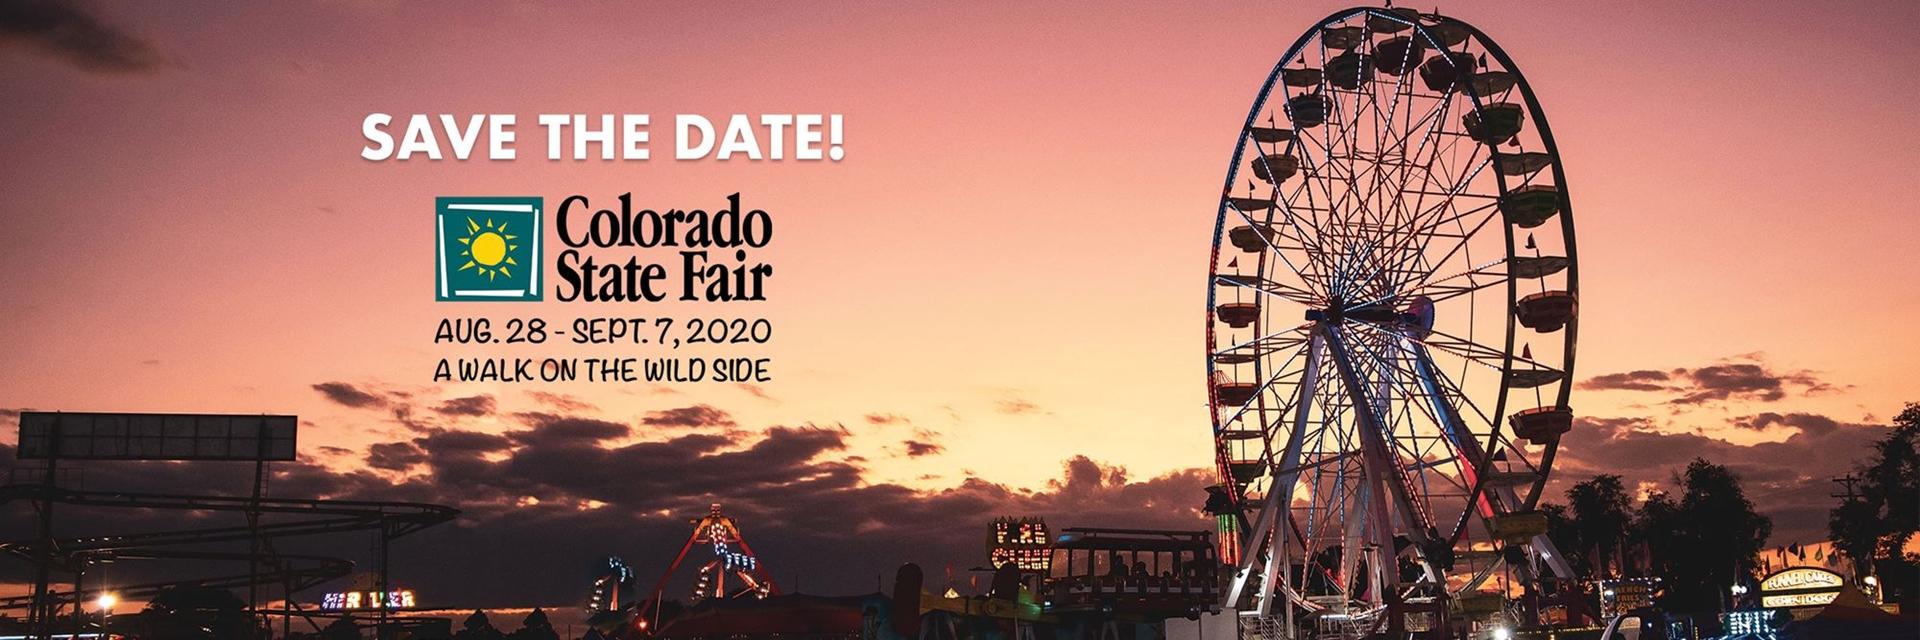 State Fair Alabama 2020.Colorado State Fair Rodeo